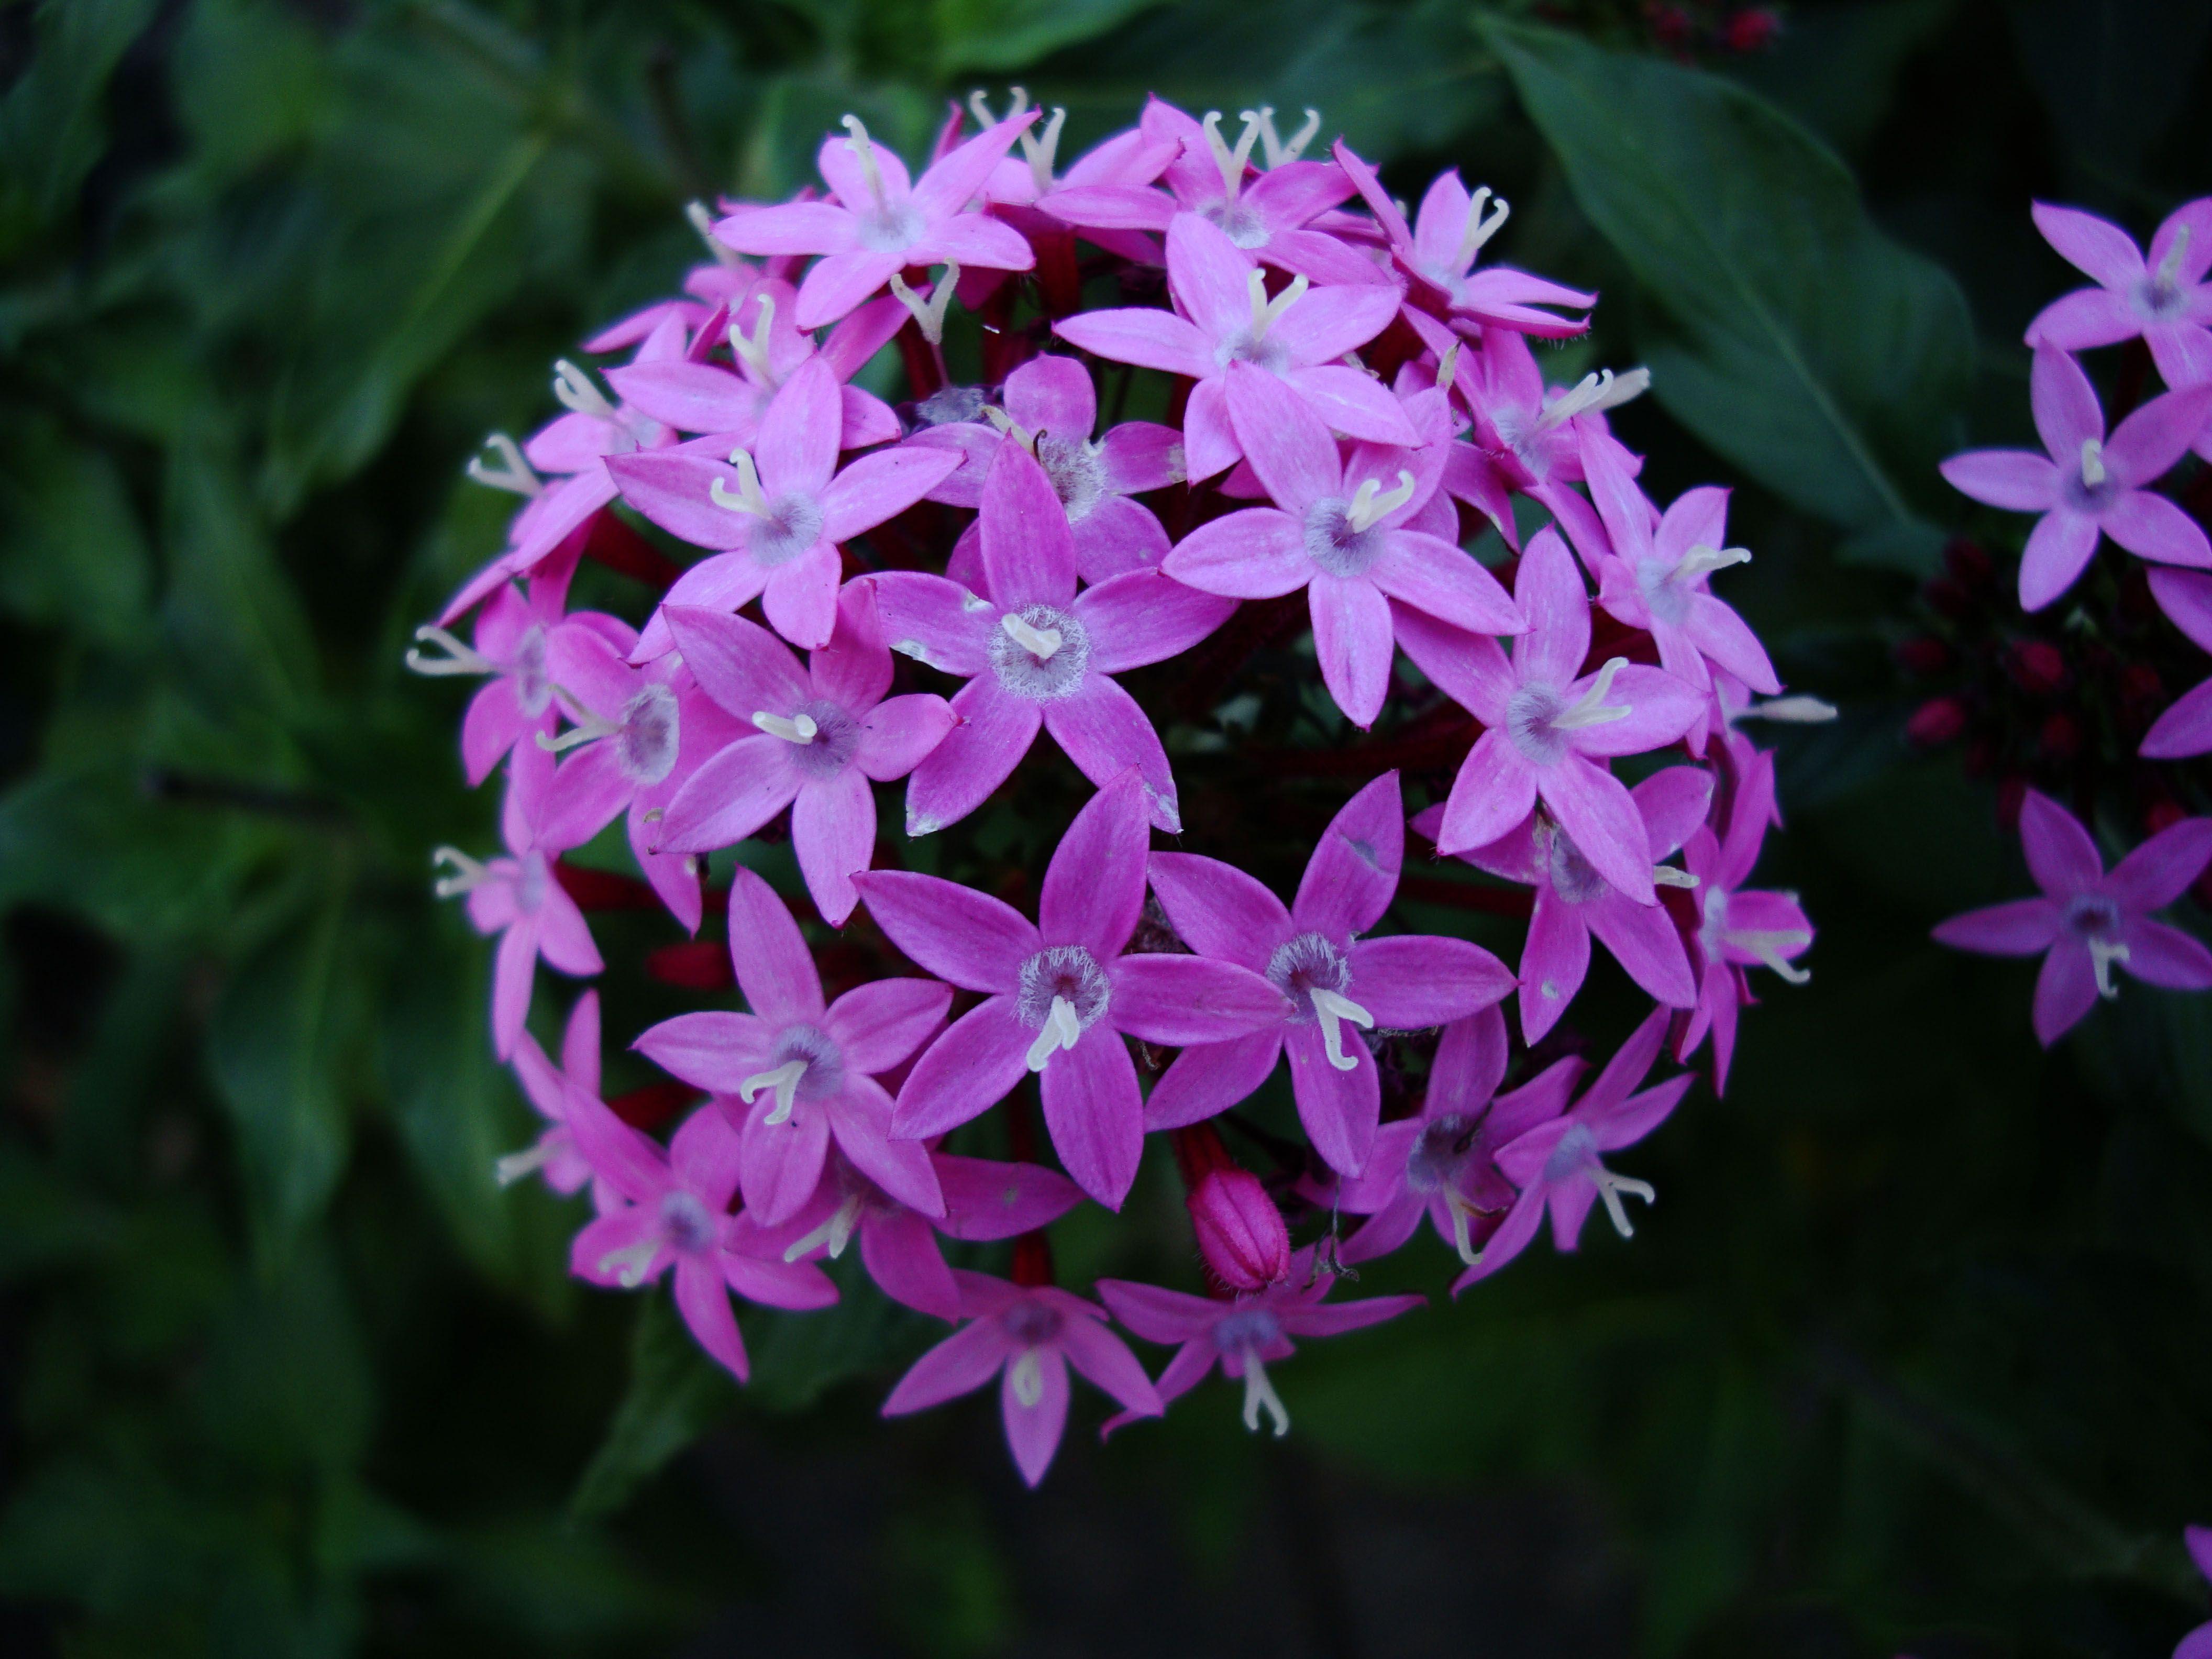 Spring Flowers Malaney Queensland Australia 014 Flowers